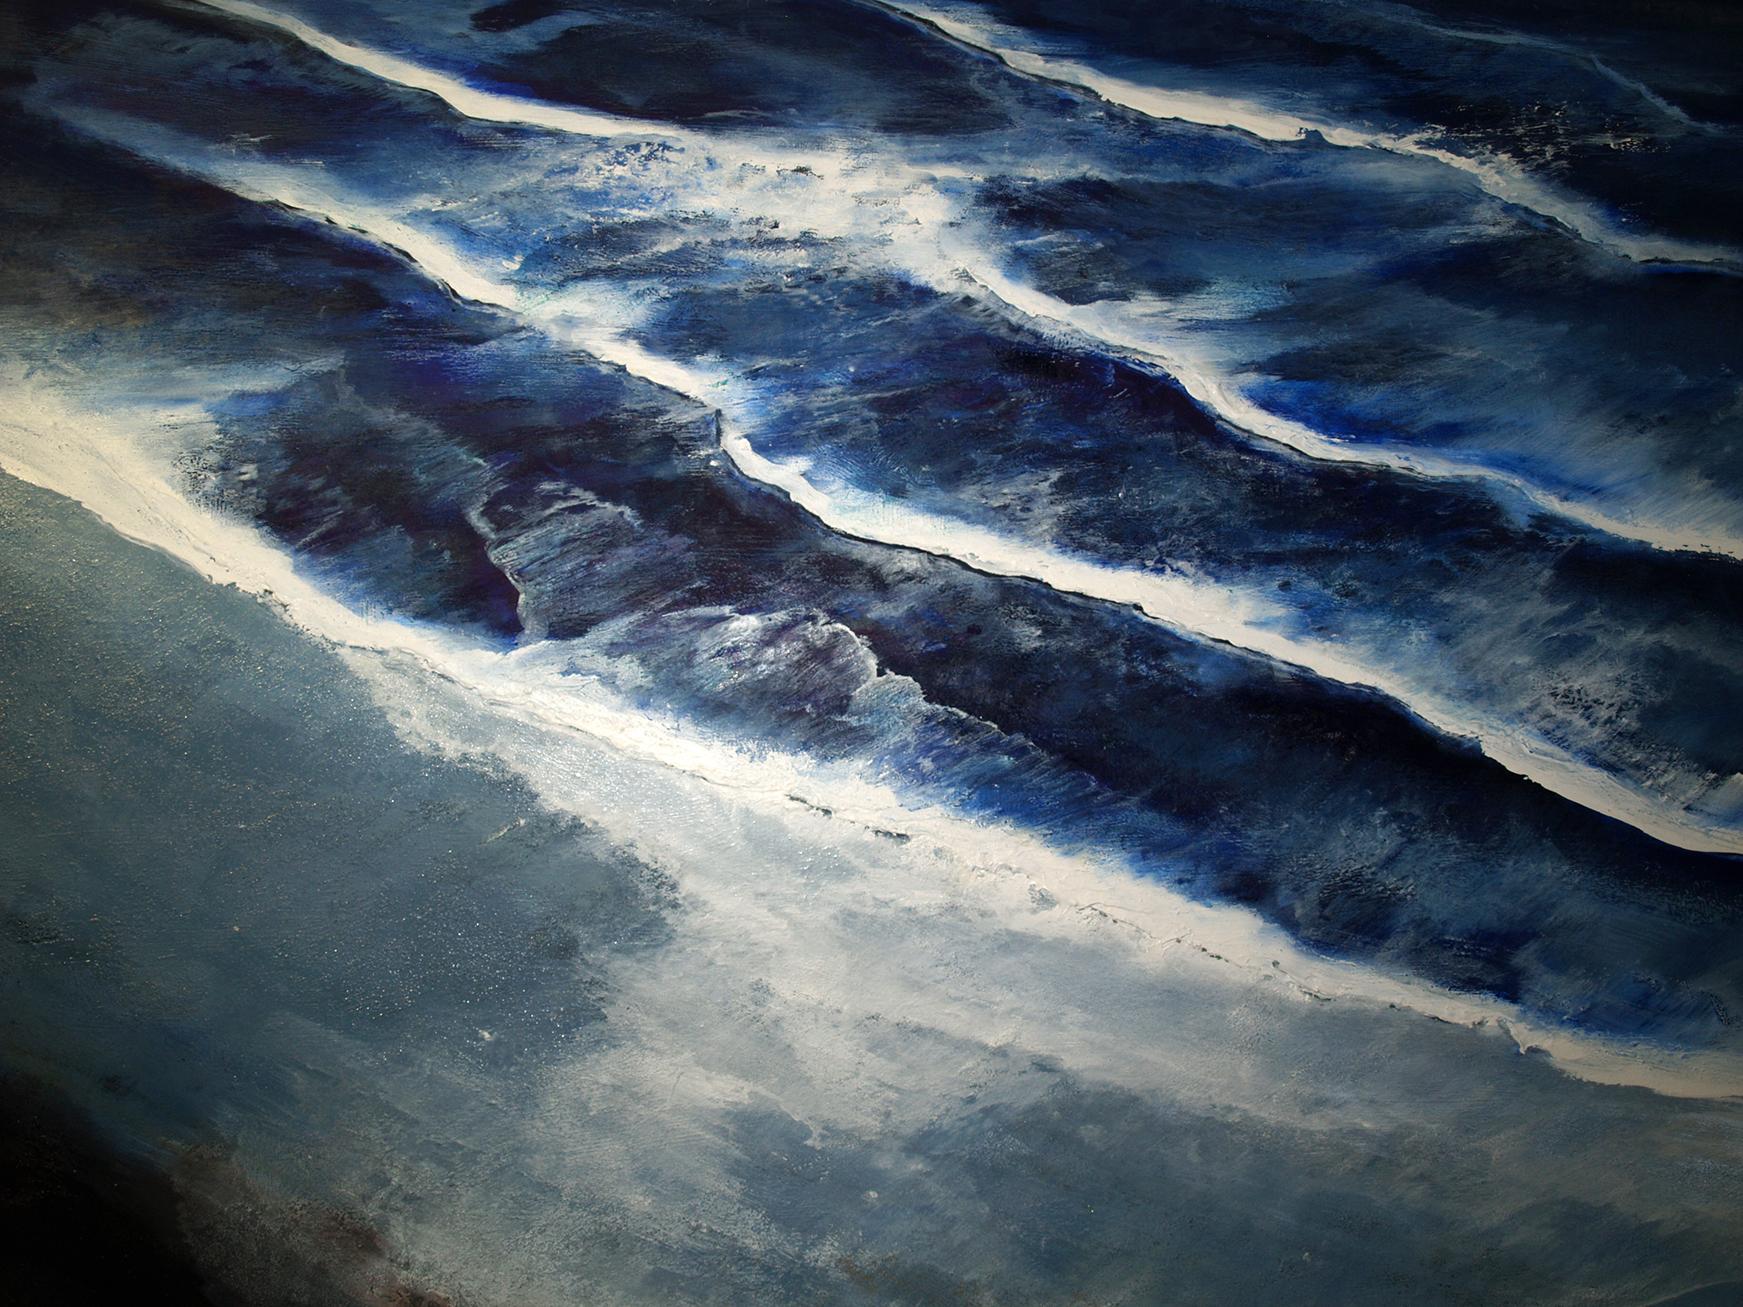 particolare-del-dipnto-WATERLINE.olio-su-tela-cm-200x150.Santosuosso2018